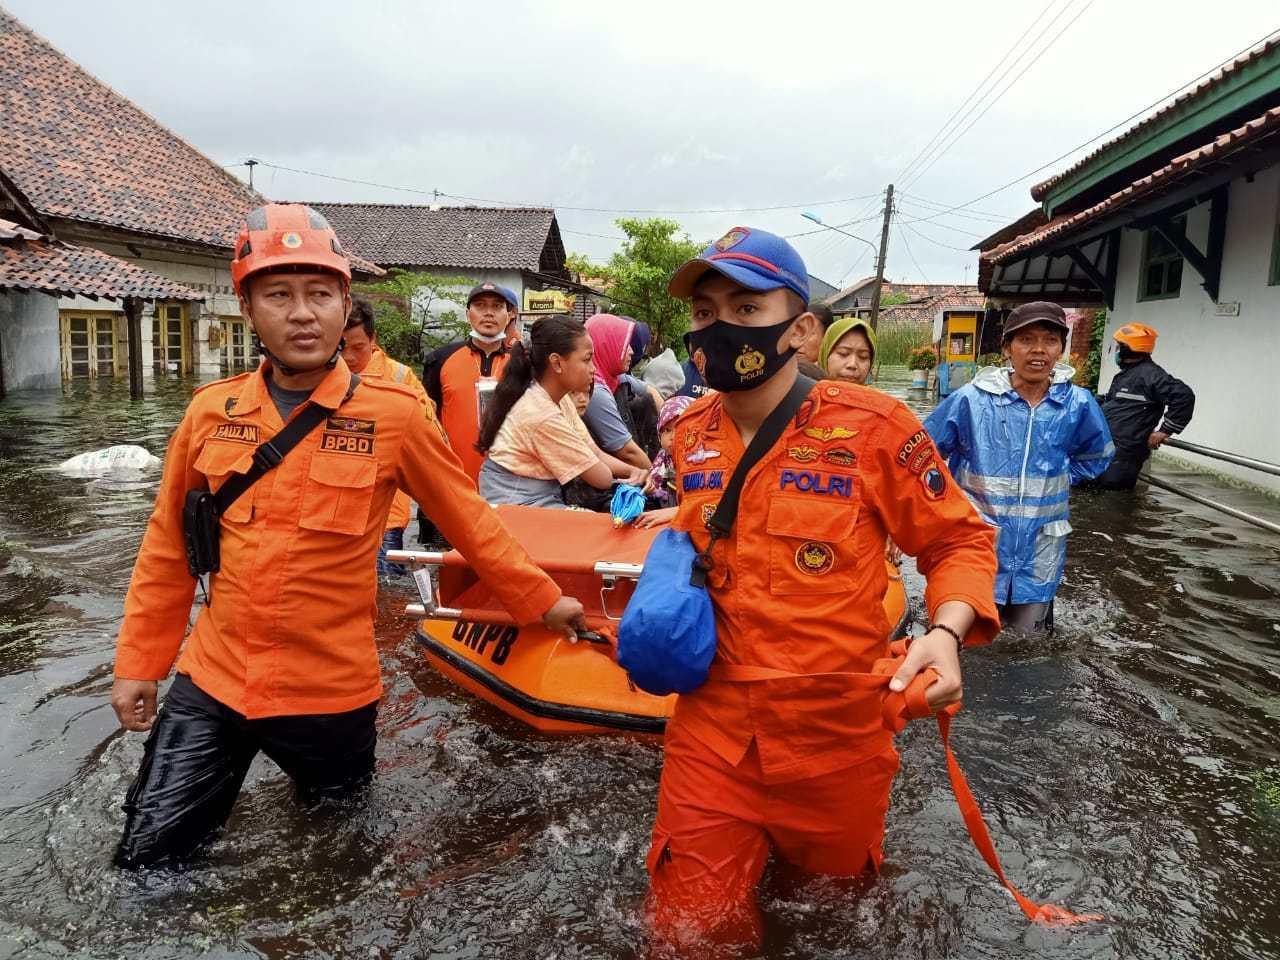 Bersama Petugas Gabungan, Personel Ditpolairud Polda Jateng Evakuasi Korban Banjir Semarang